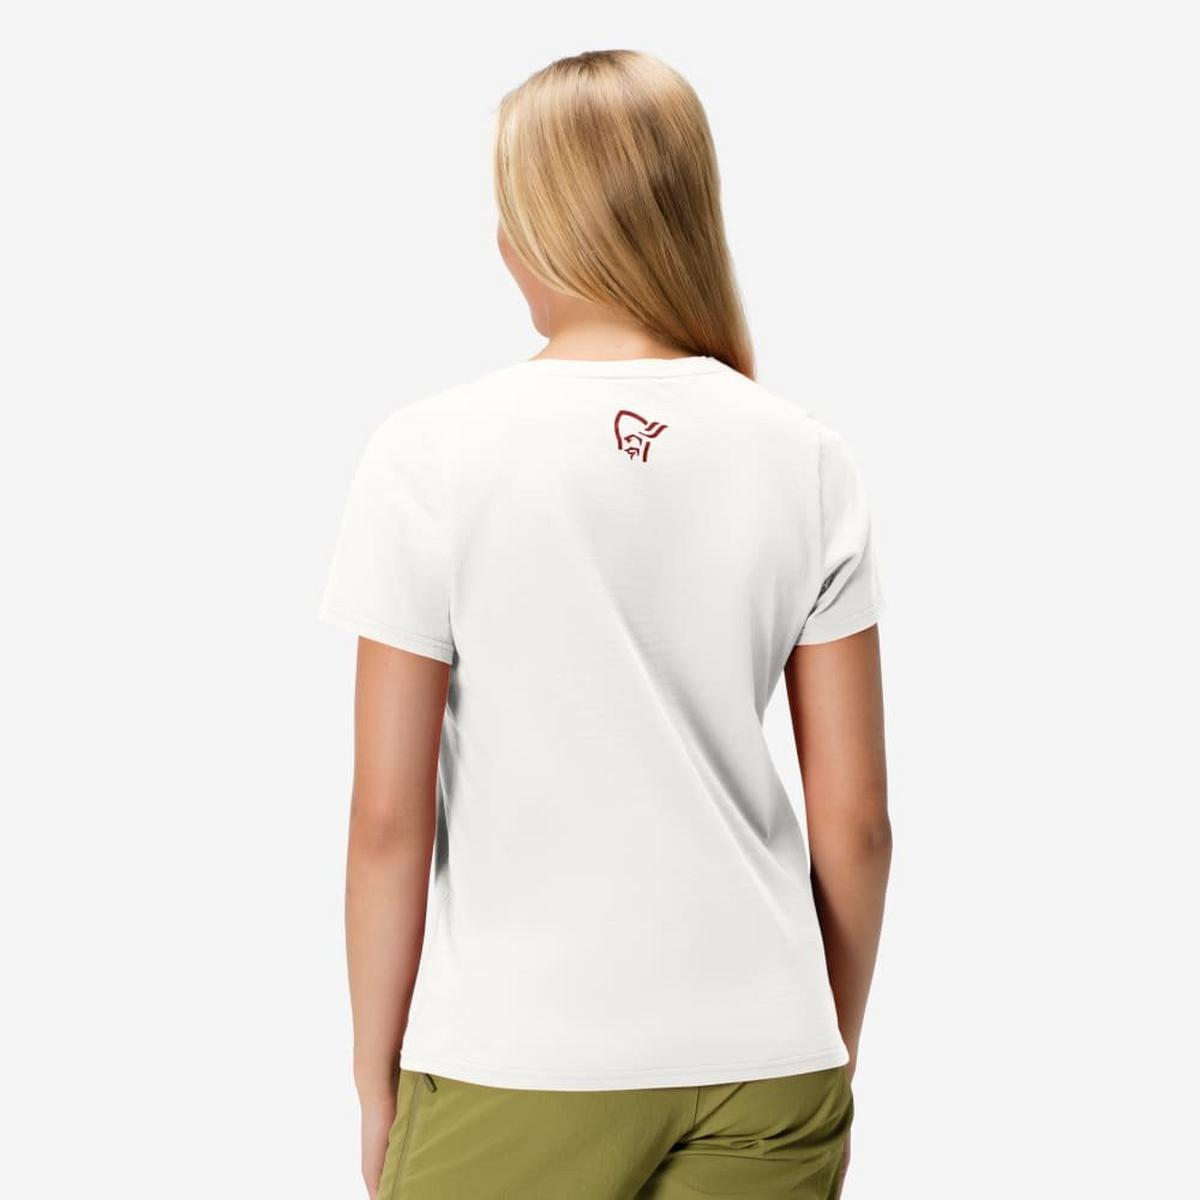 Norrona Women's /29 Cotton Legacy T-Shirt - White